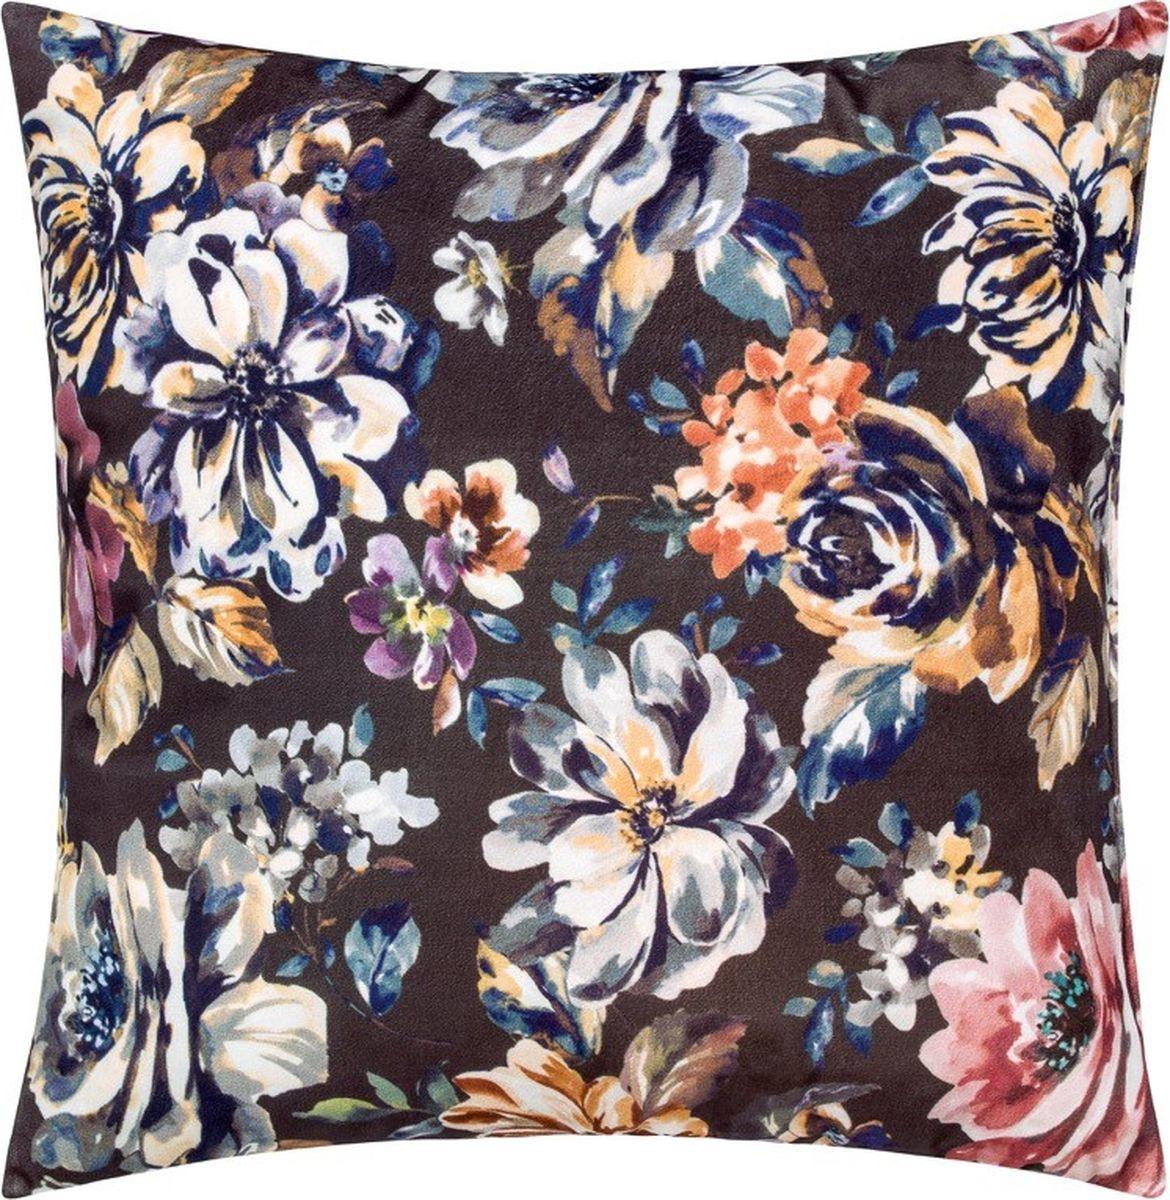 Подушка декоративная Togas Лена, цвет: серый, 45 х 45 см40.16.70.0279